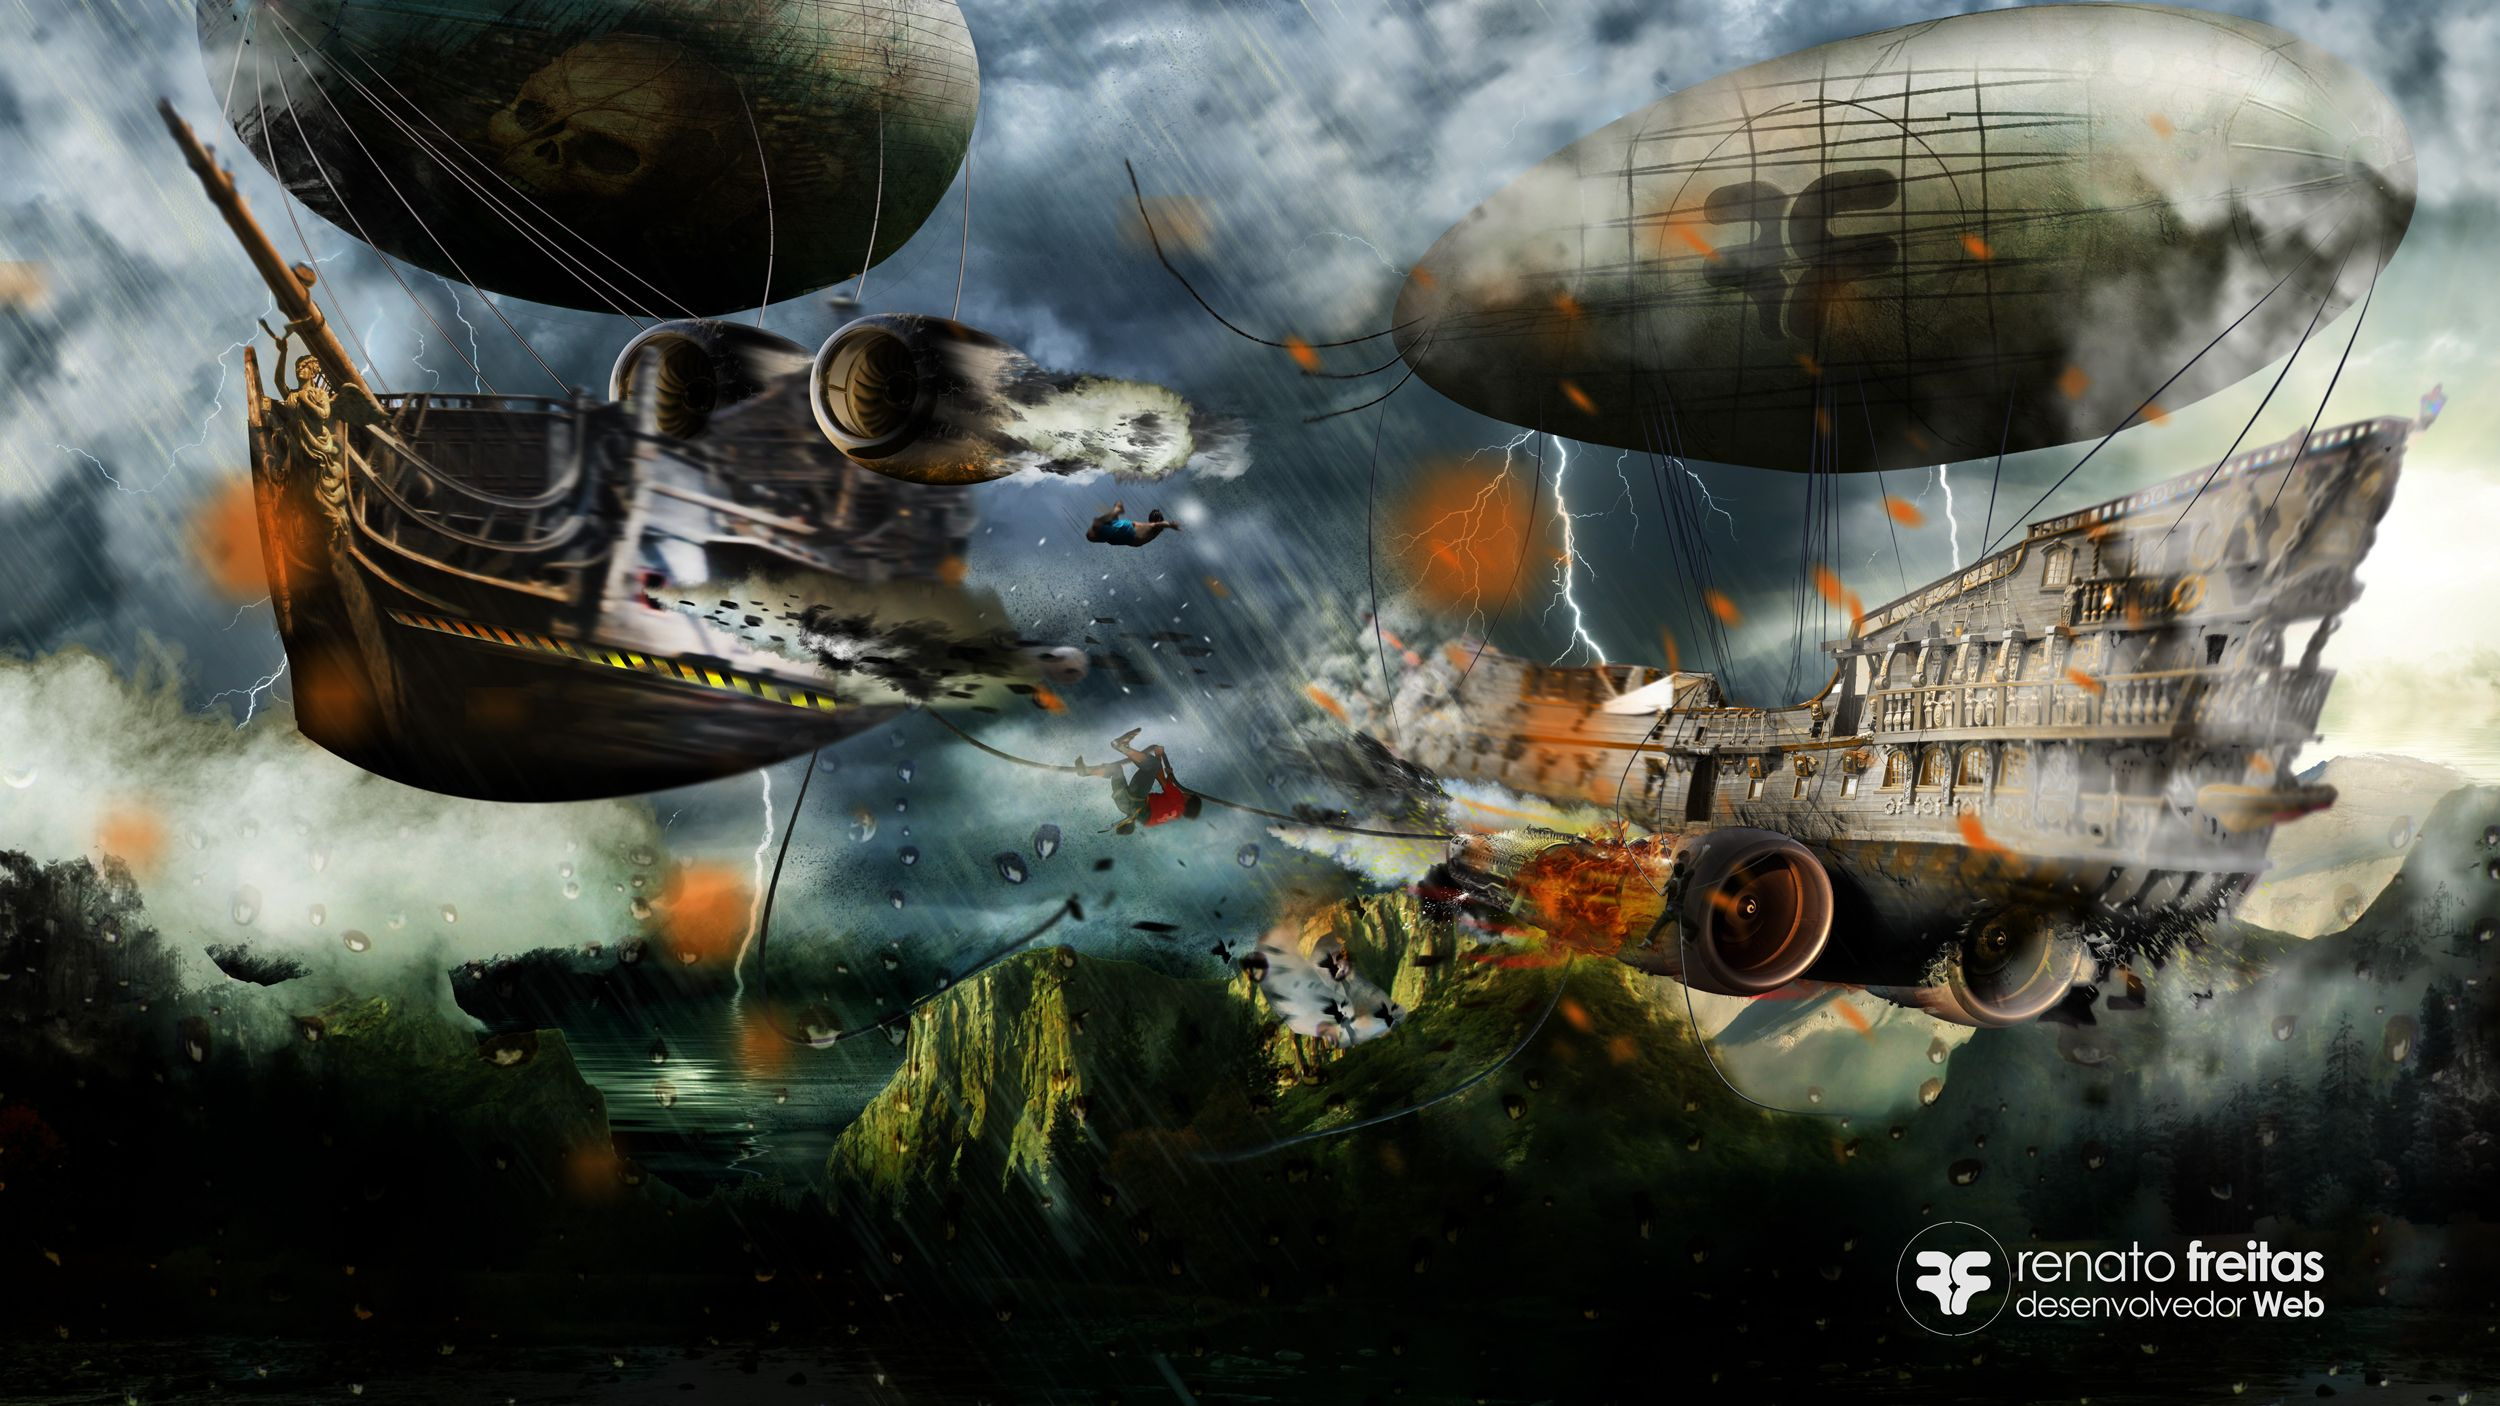 Airship Pirate Speed Art - #Photoshop CC http://www.youtube.com/watch?v=ey0Hc7Dj-P0